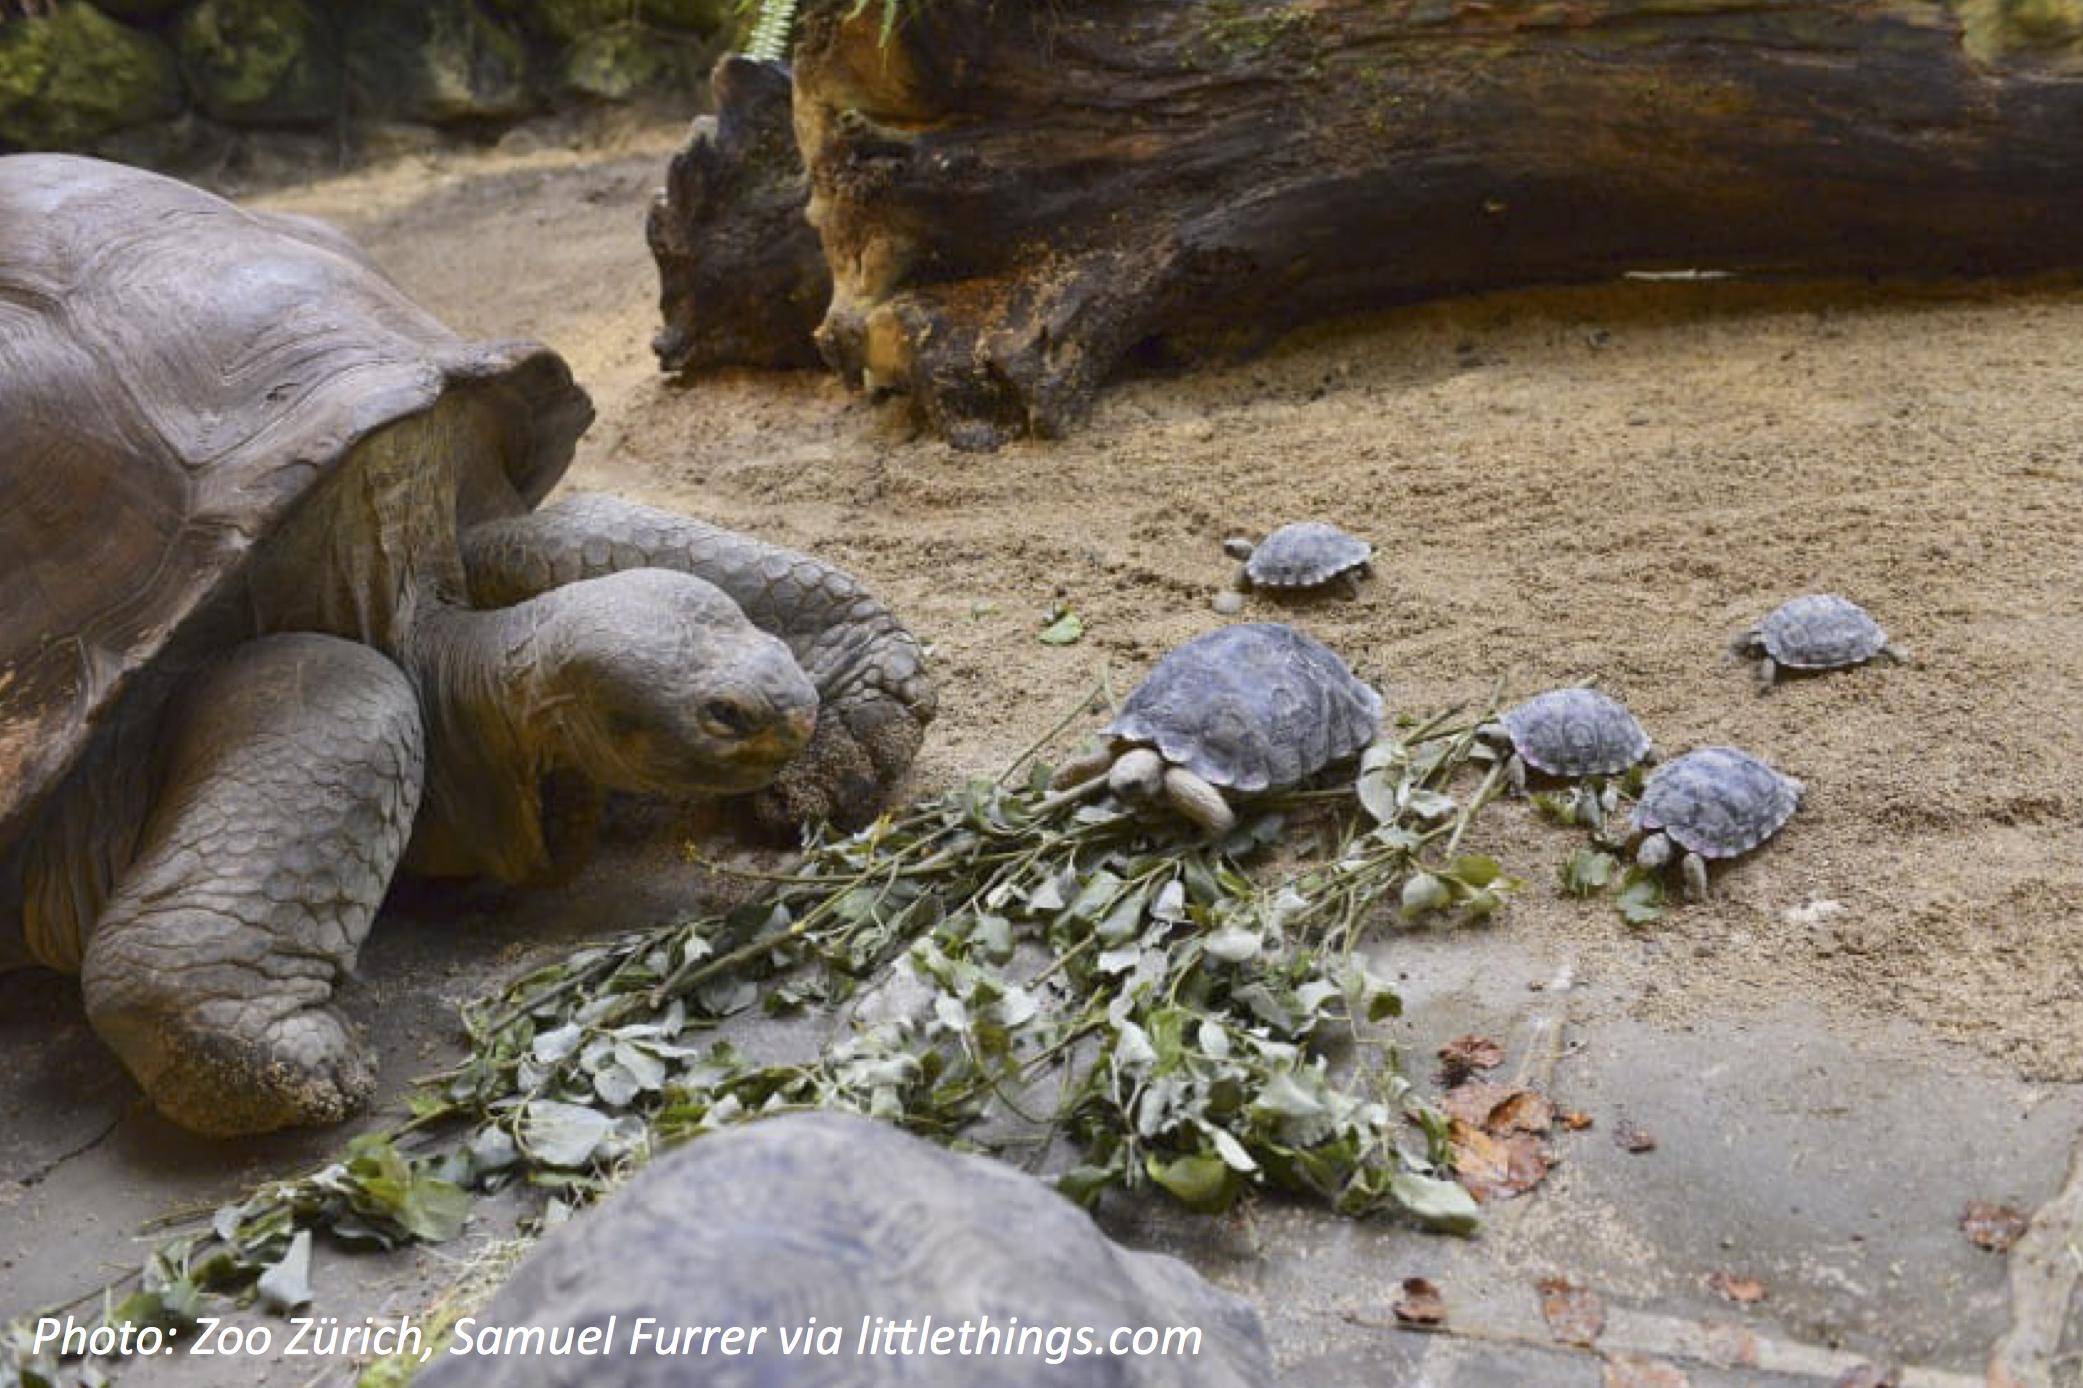 Giant Family for a Giant Tortoise